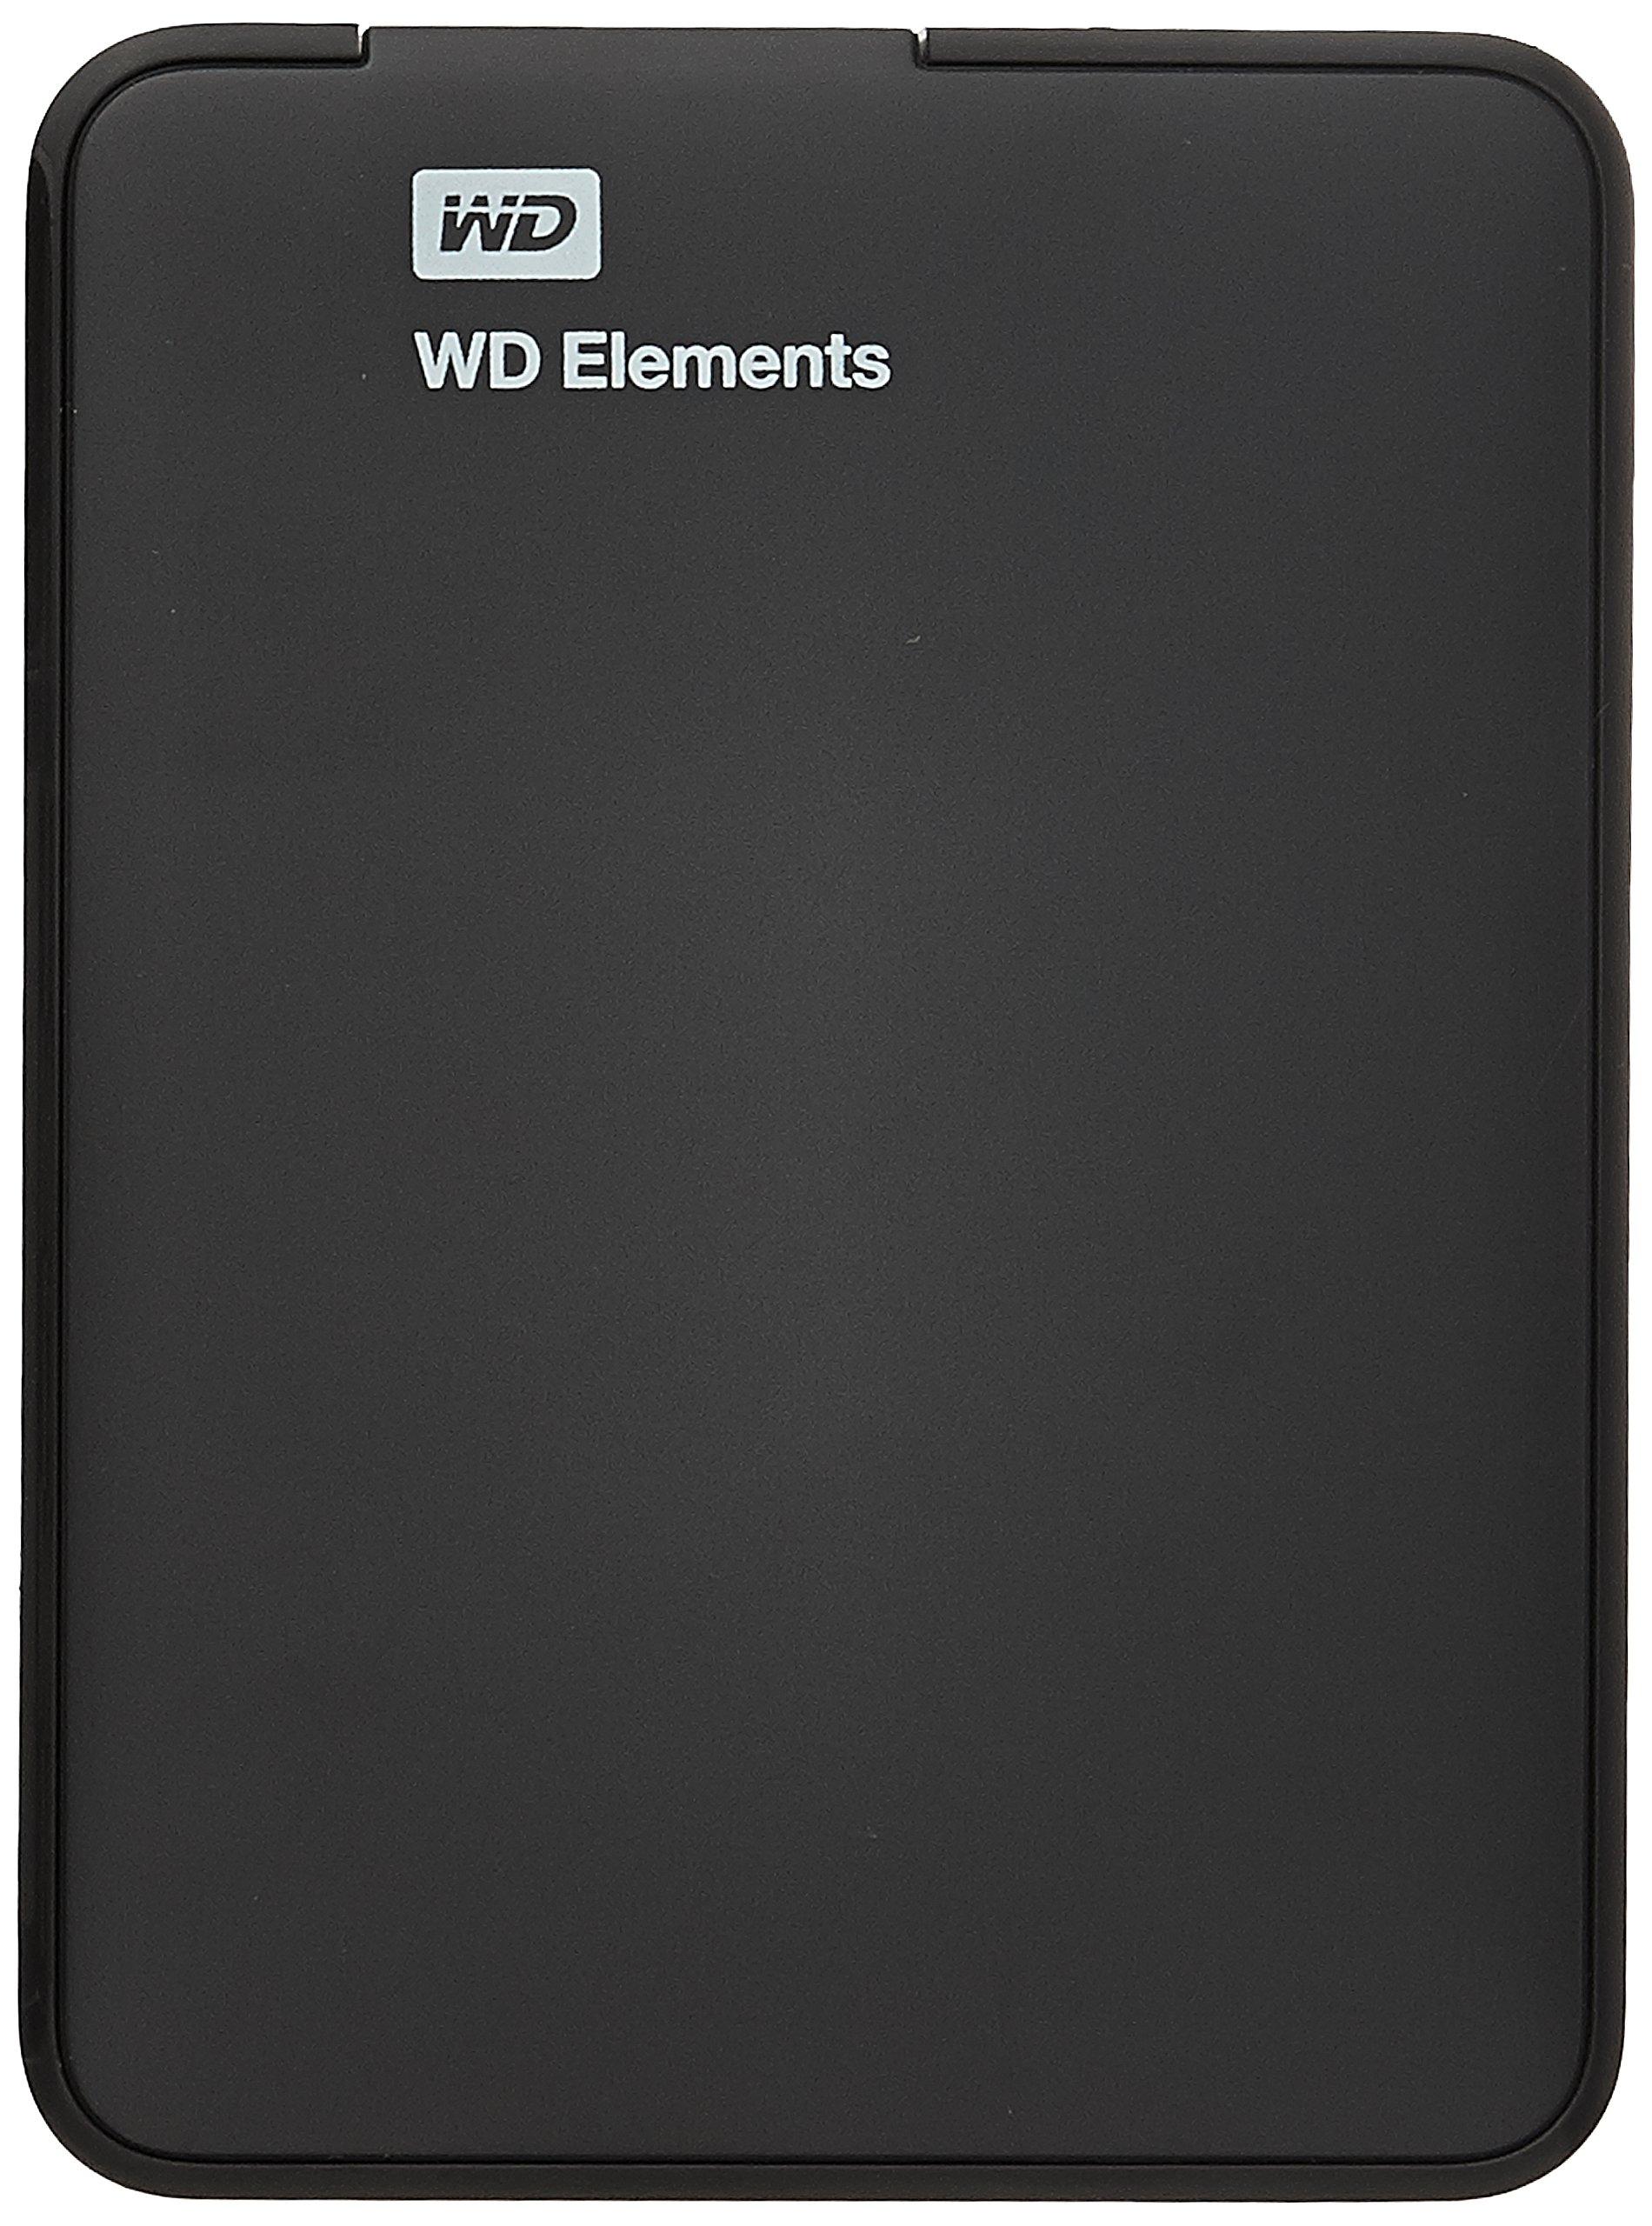 Western Digital Elements 1TB USB 3.0 Portable External Hard Drive (Black) product image